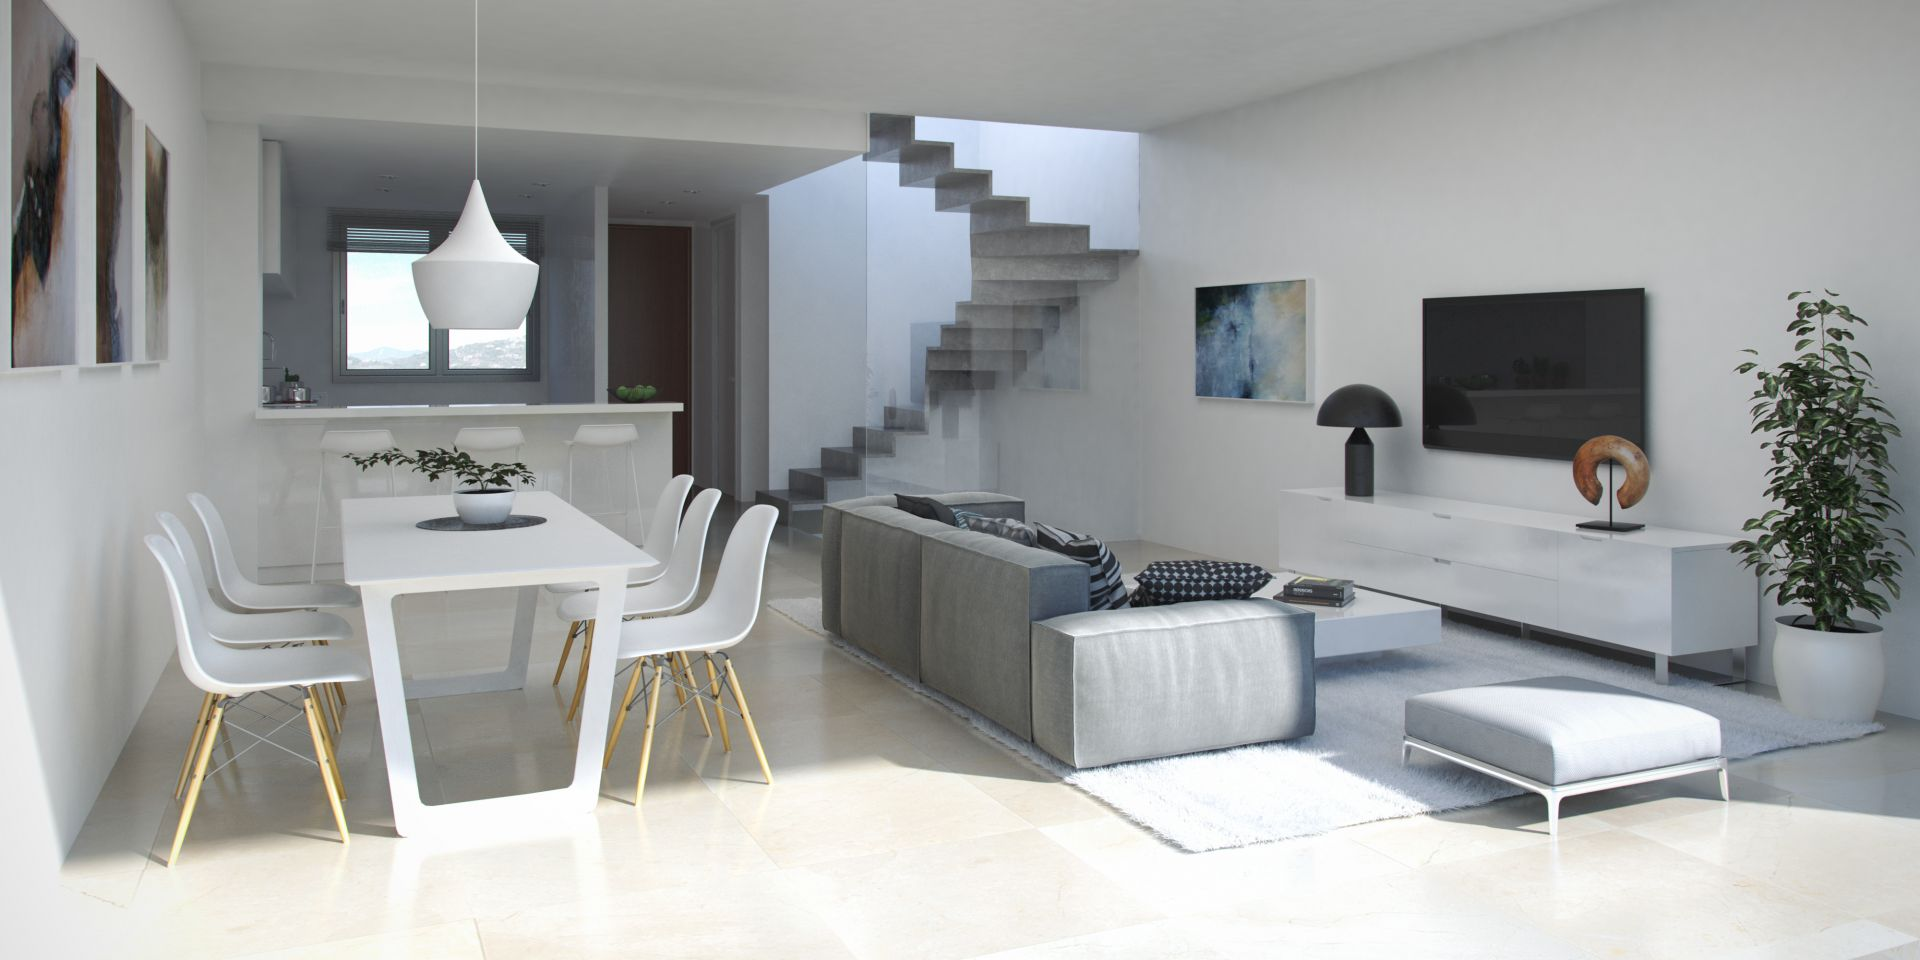 Photo gallery - New modern townhouses for sale in La Cala de Mijas